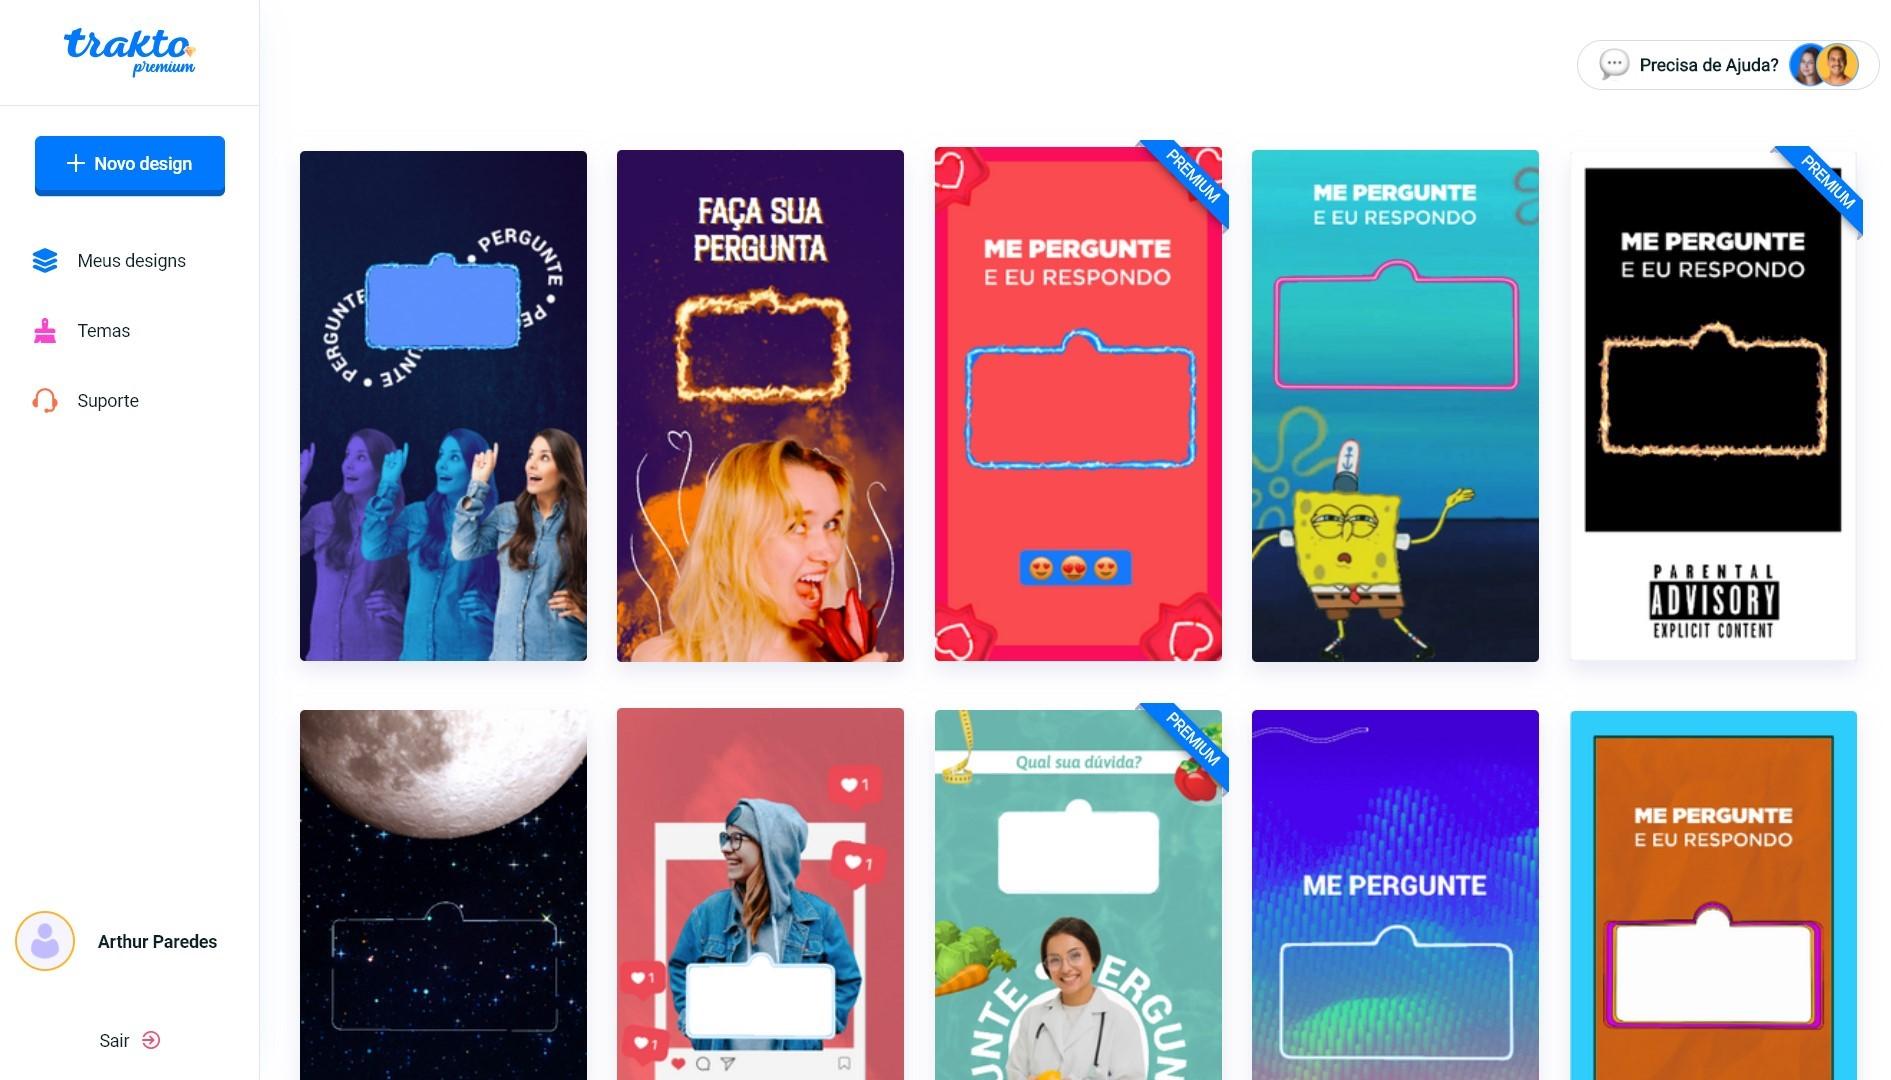 trakto galeria perguntas caixa instagram - 23 modelos para caixa de perguntas do Instagram para se inspirar